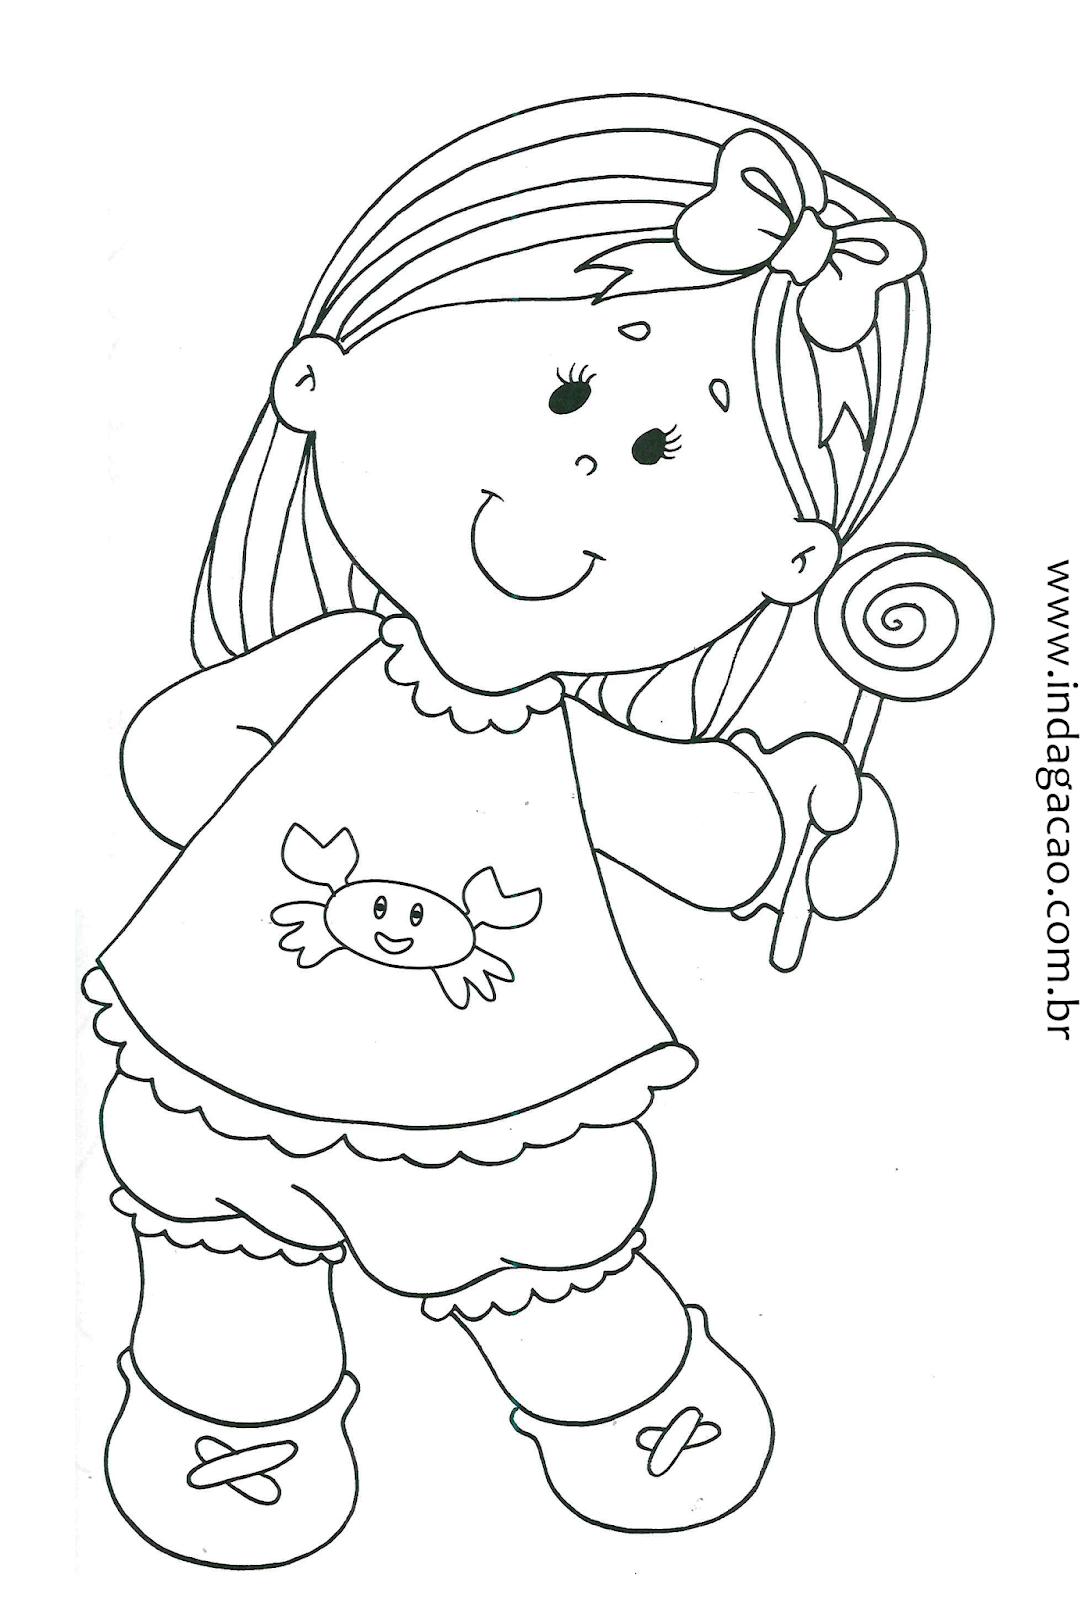 Desenho De Menina Pirulito Baixar Gratis Riscos Para Pintura